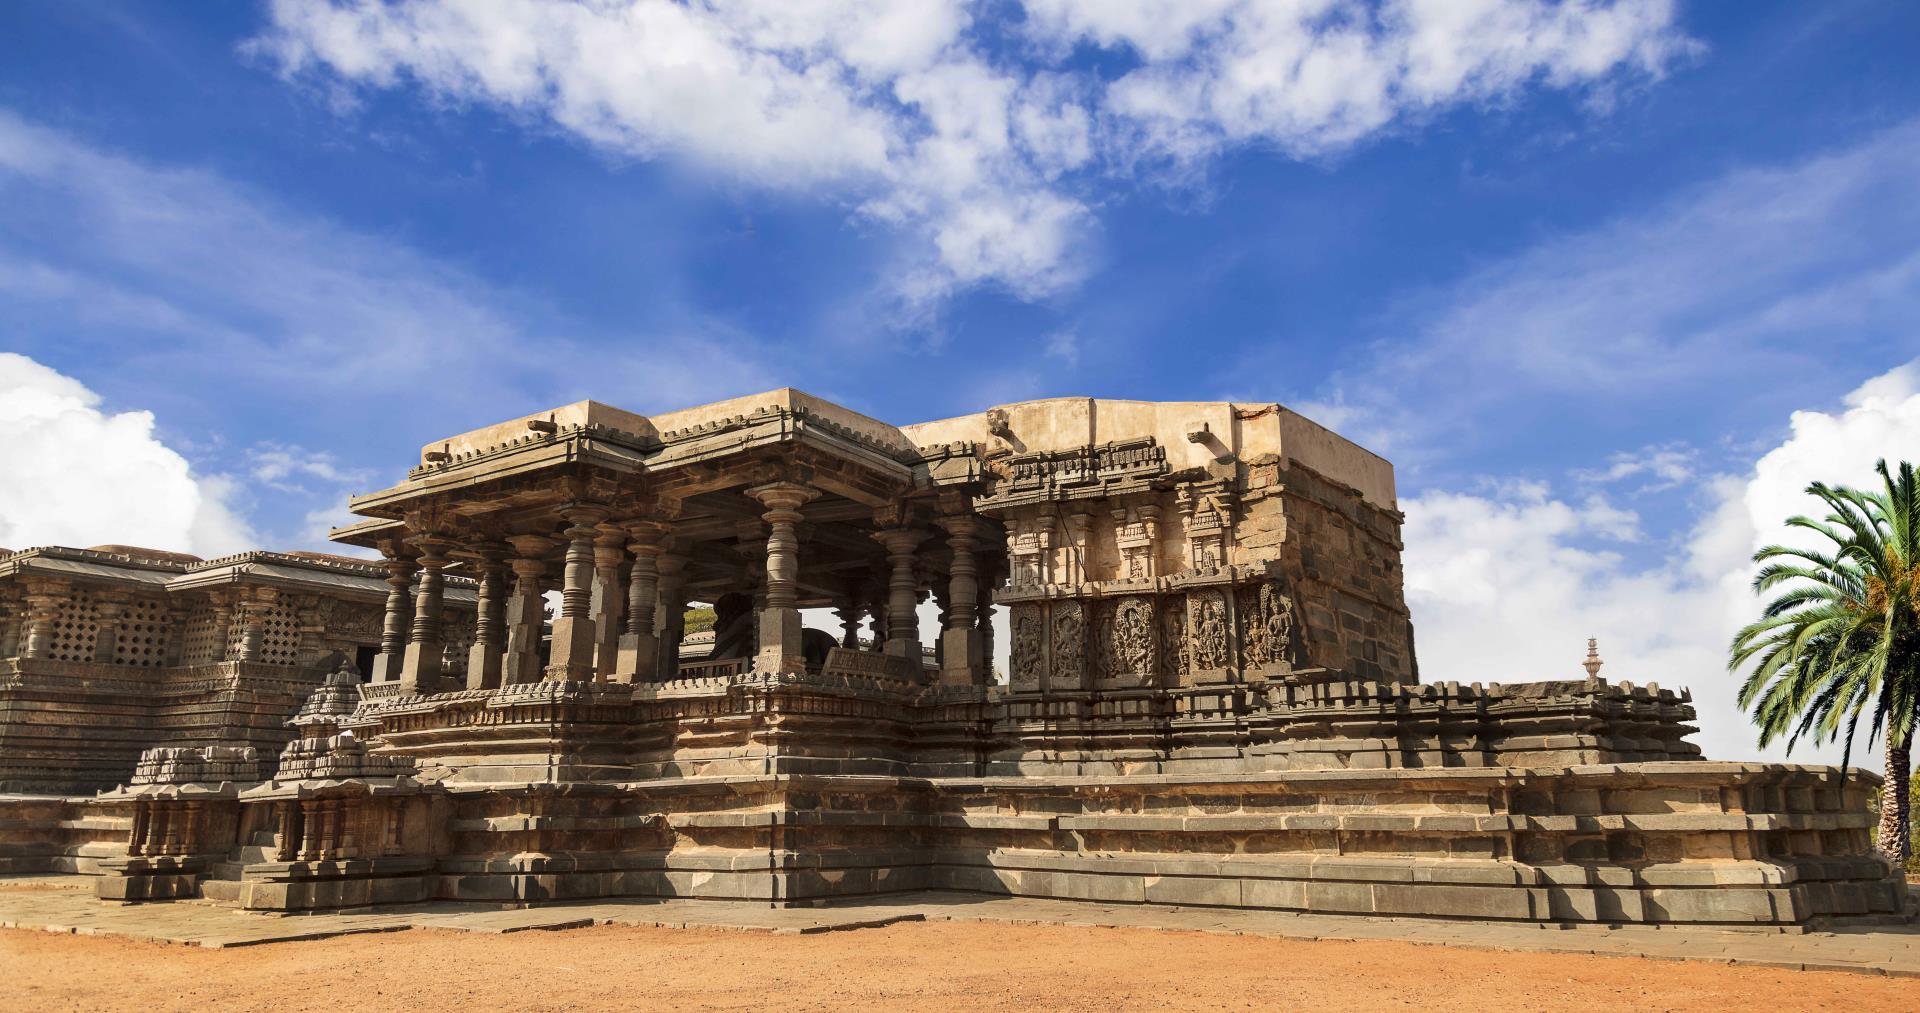 Hubli to Badami, Hampi, Belur, Halebidu, Mysore & Bangalore Tour 1